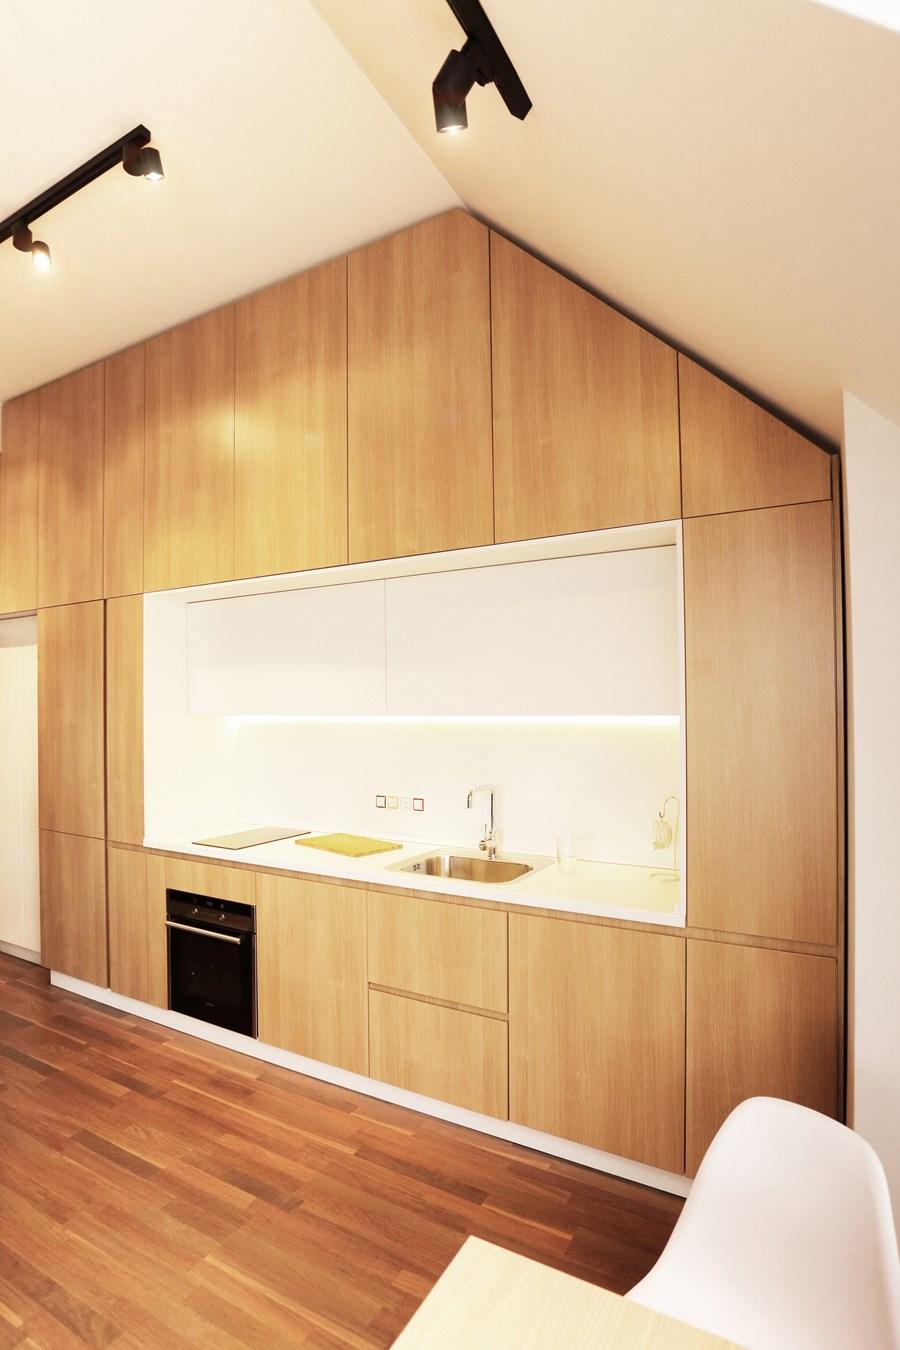 Small apartment by Edo Design Studio 13